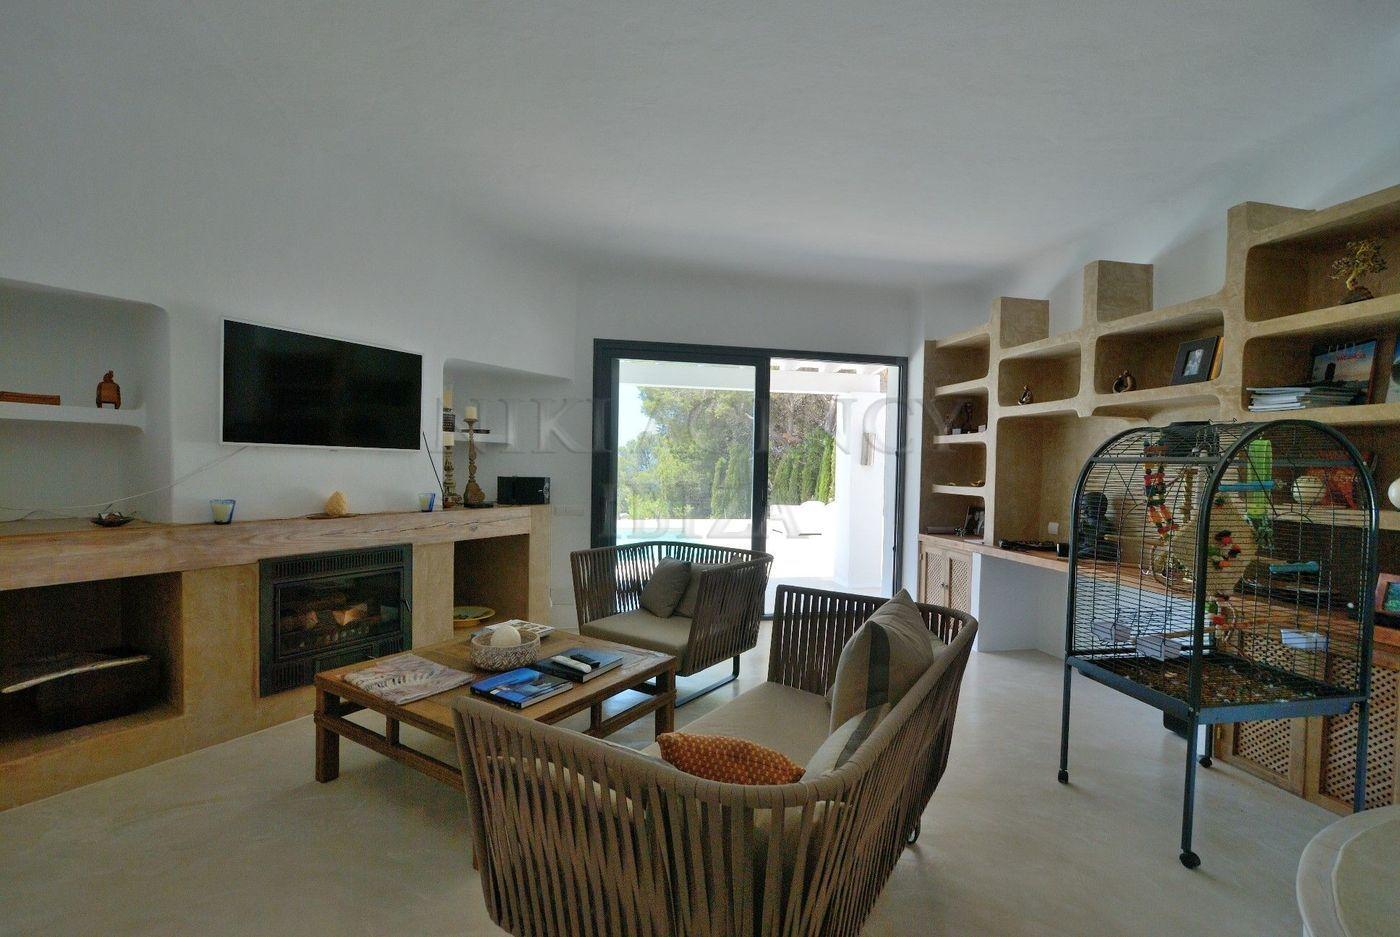 10. House for sale in Sant Josep de sa Talaia Ibiza - Fantastic 4 Bed Villa For Sale in Sant Josep de sa Talaia, Ibiza!